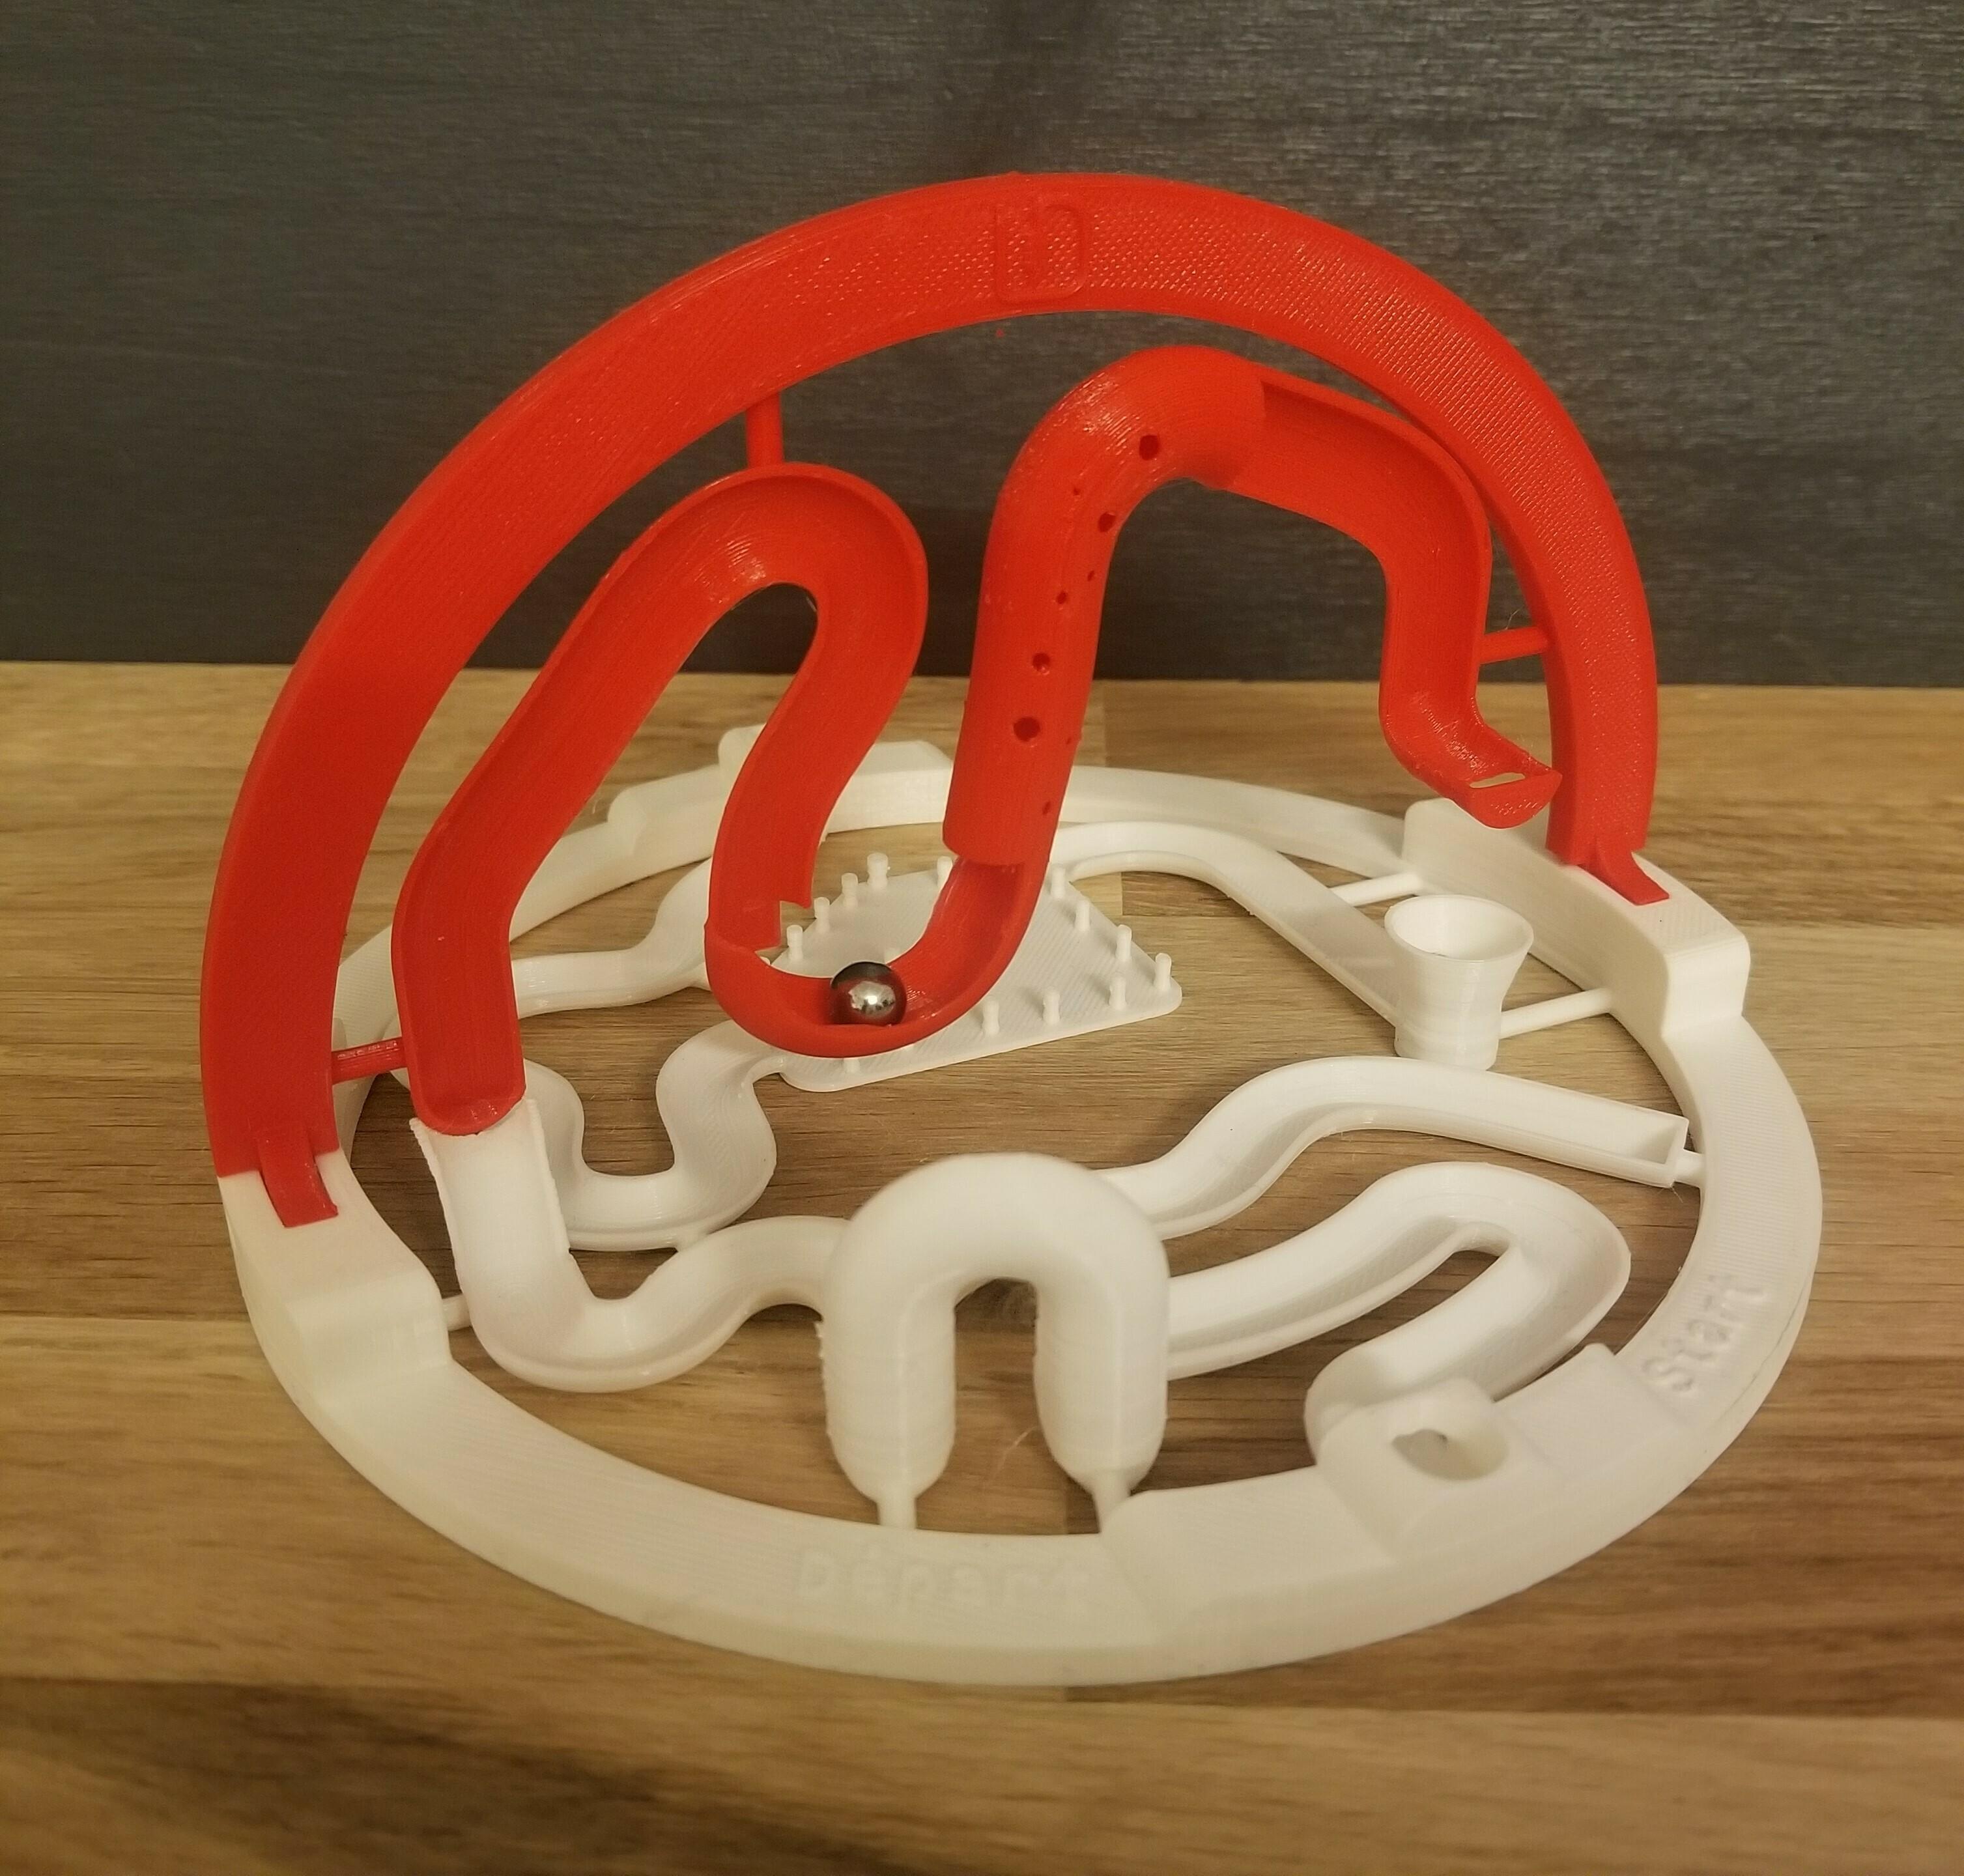 20201220_190039.jpg Download STL file 3D ball course • 3D printer template, LouD3D